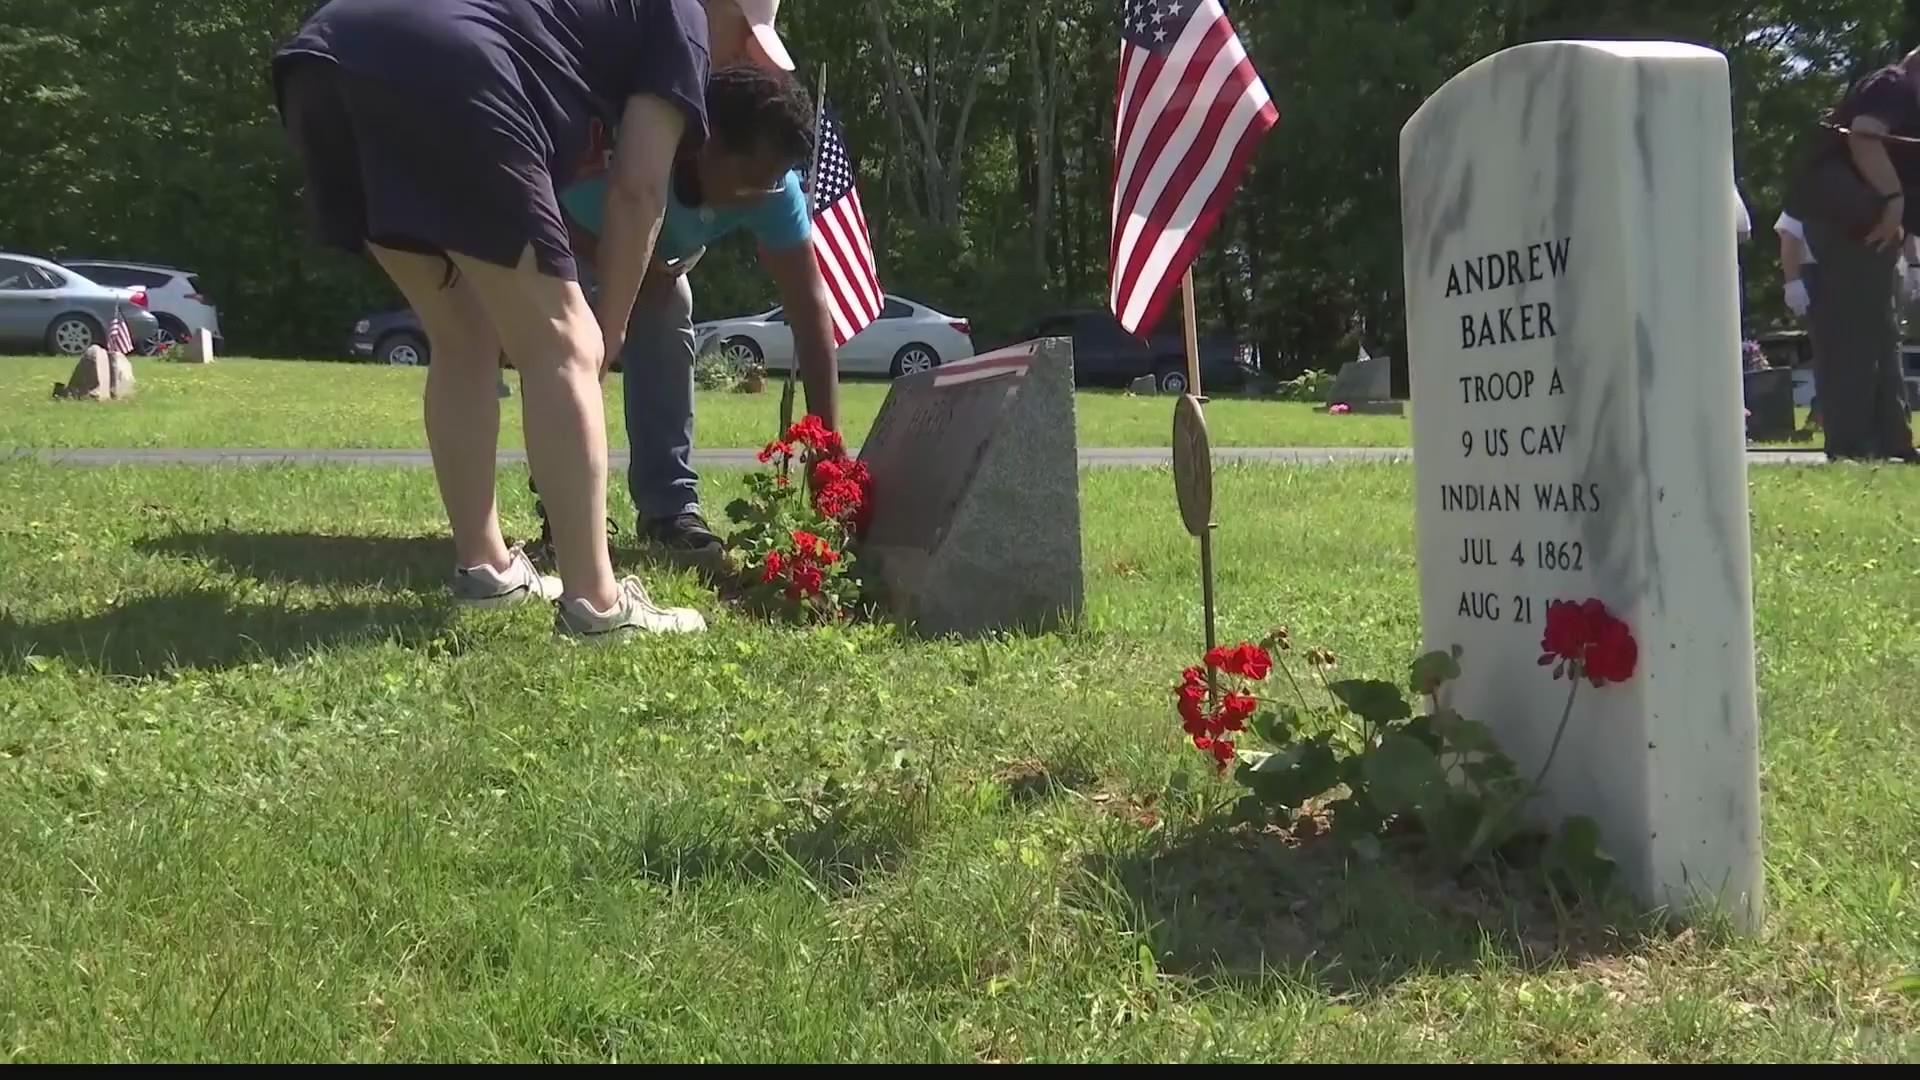 Veteran_receives_new_headstone_on_Memori_0_20190527215944